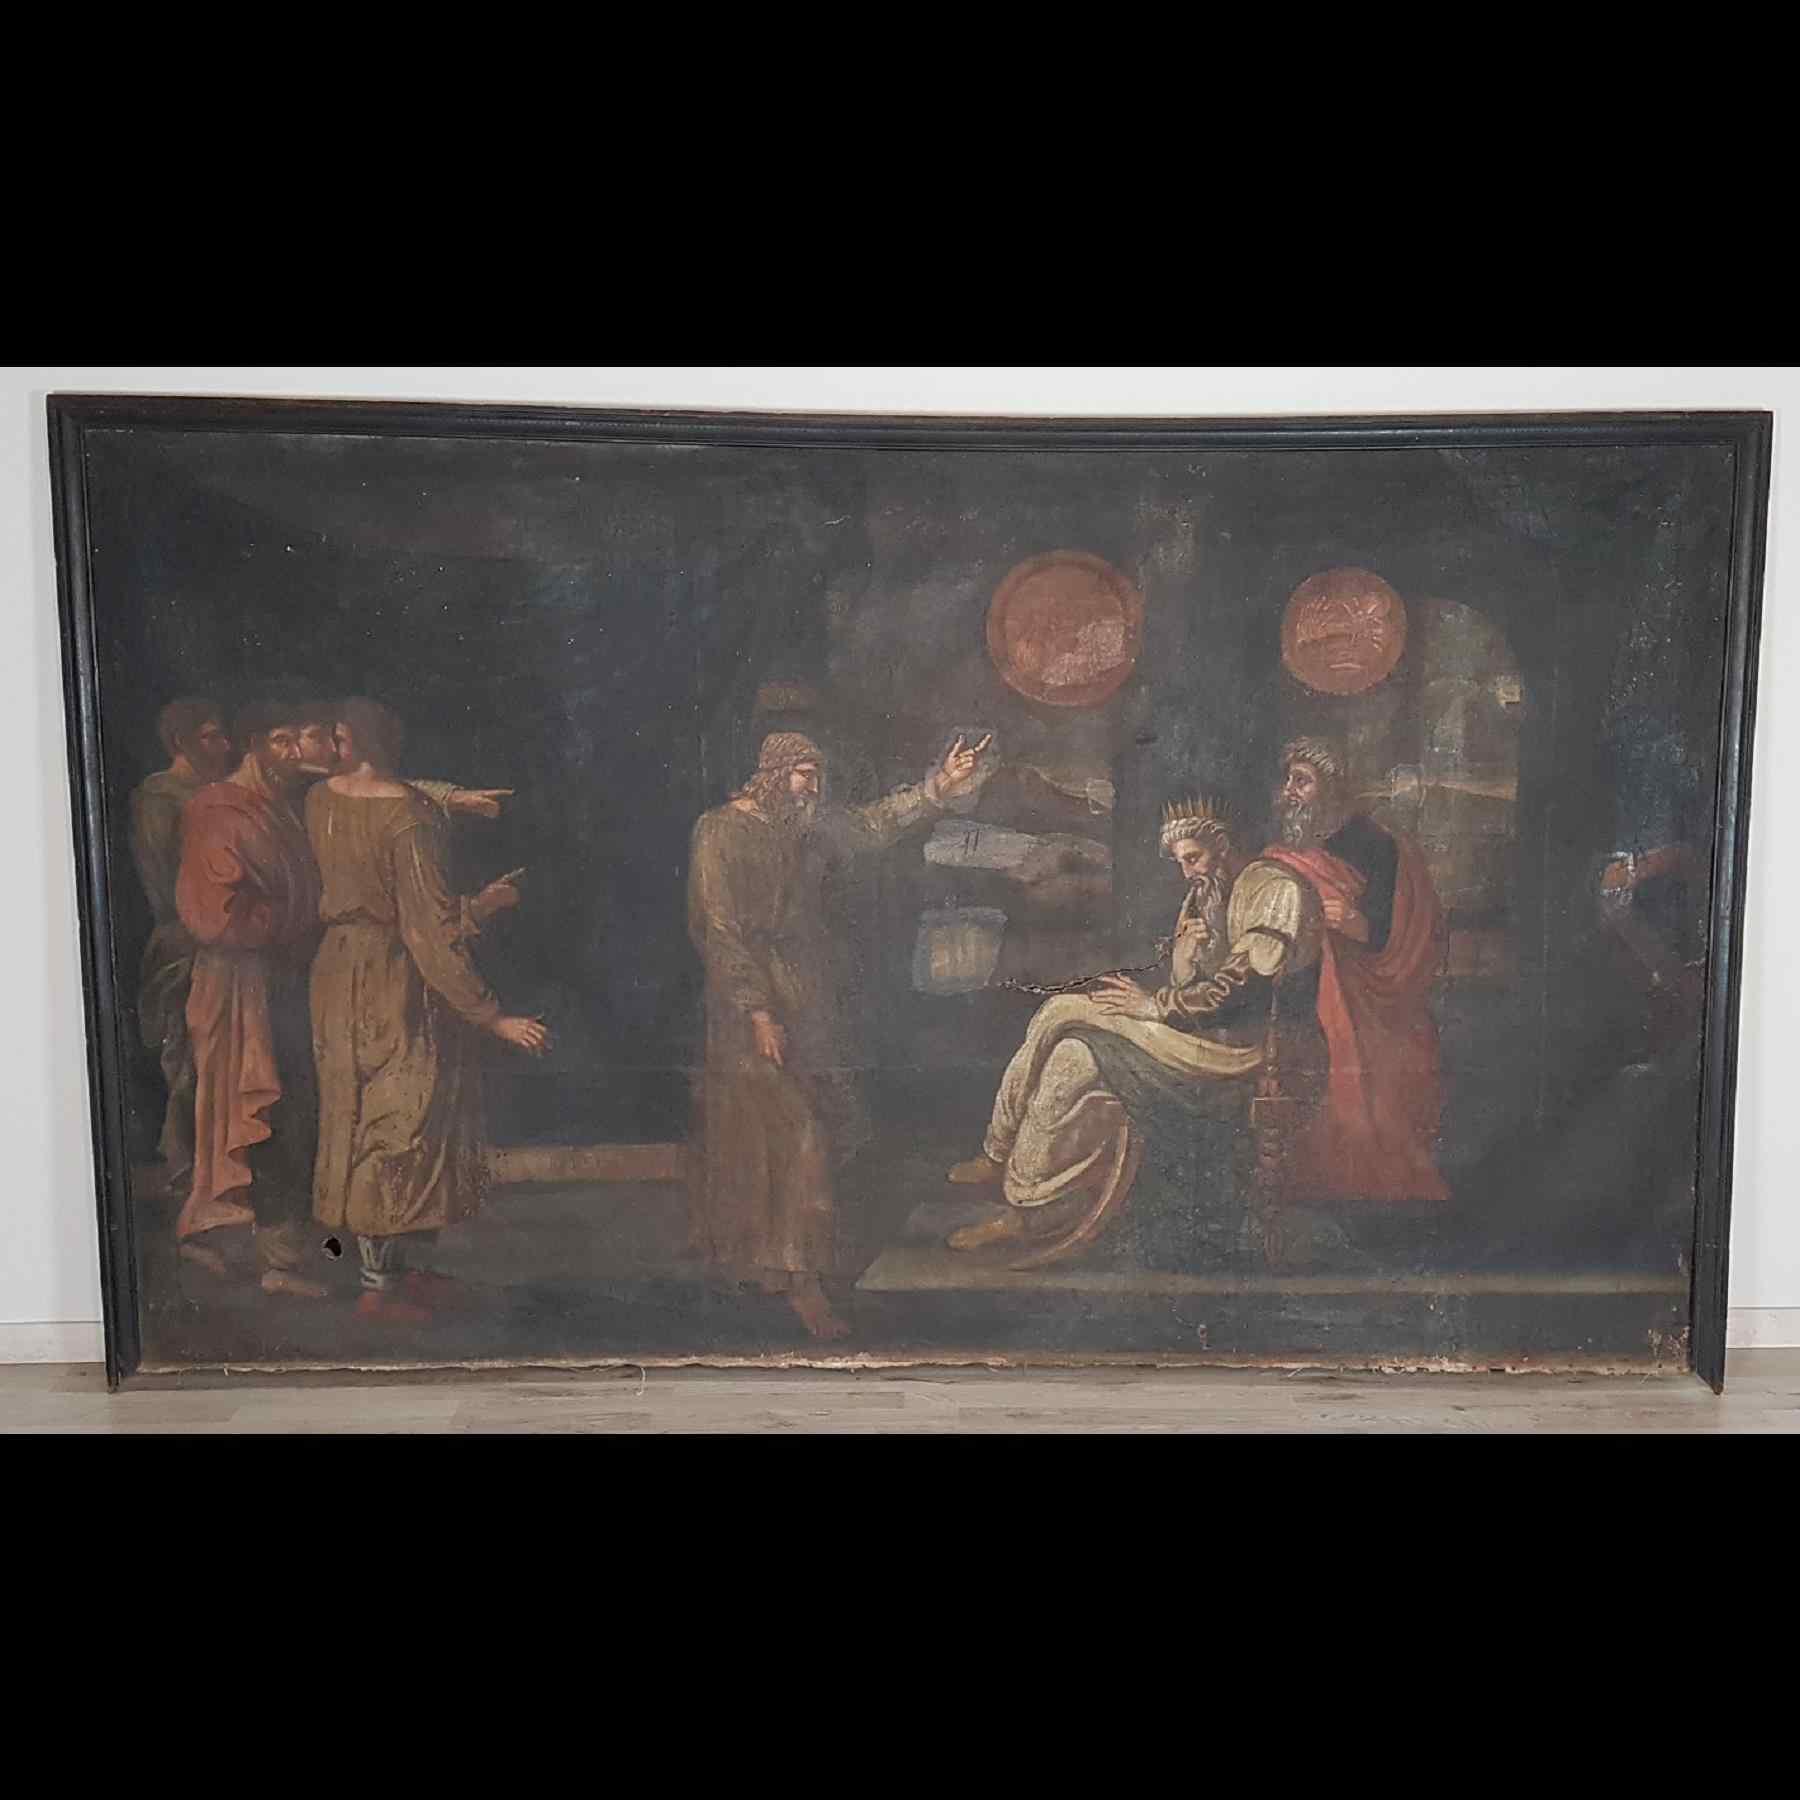 Grande dipinto antico cm 250 x 153 olio su tela Secolo XVII